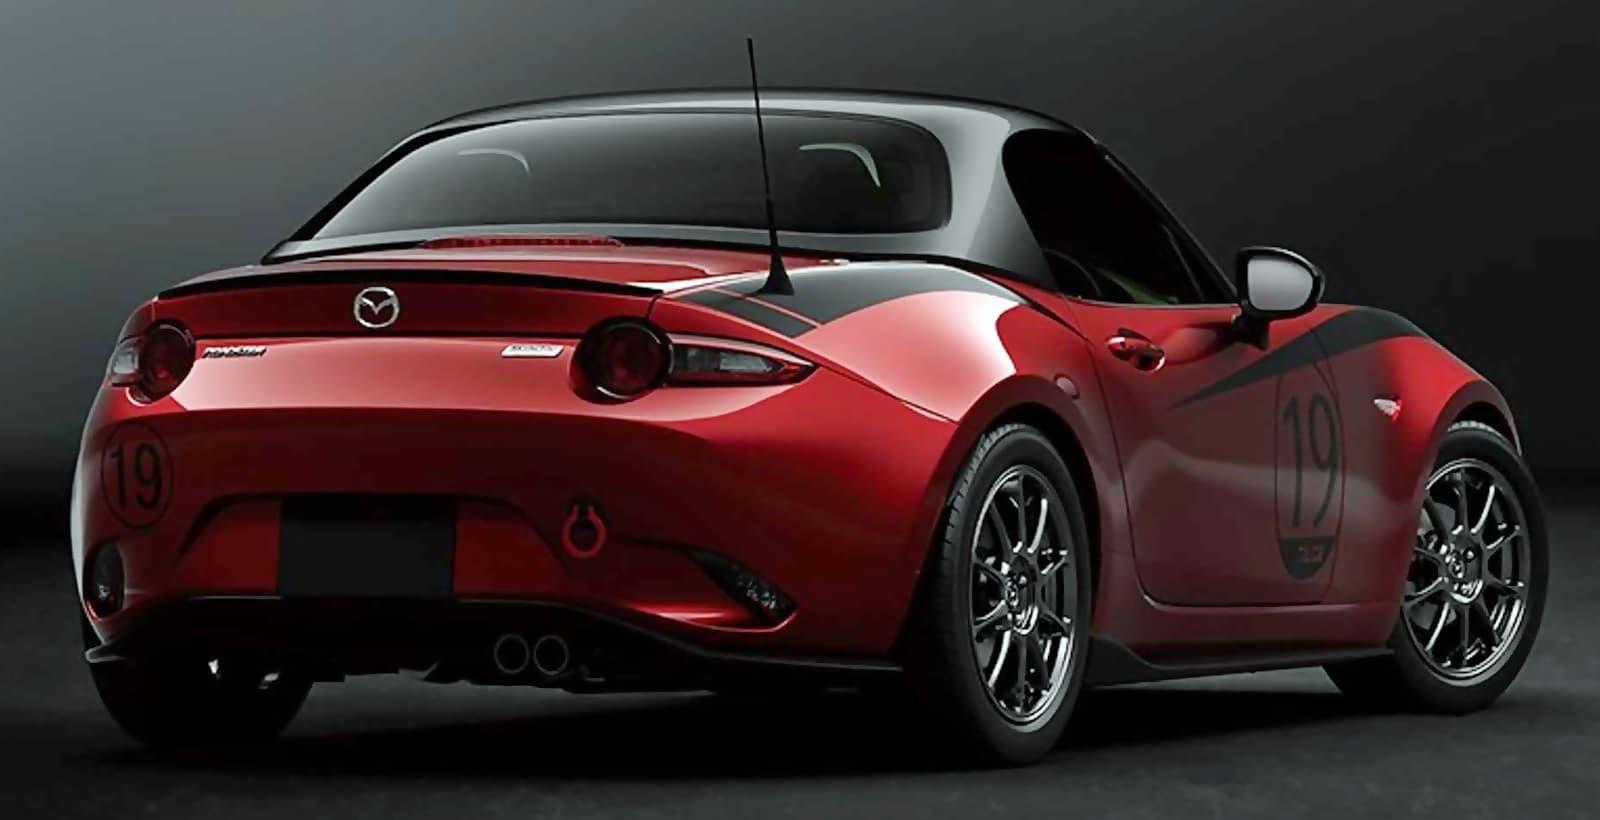 Mazda Mx 5 Roadster Drop Head Coupe Concept 1218 01